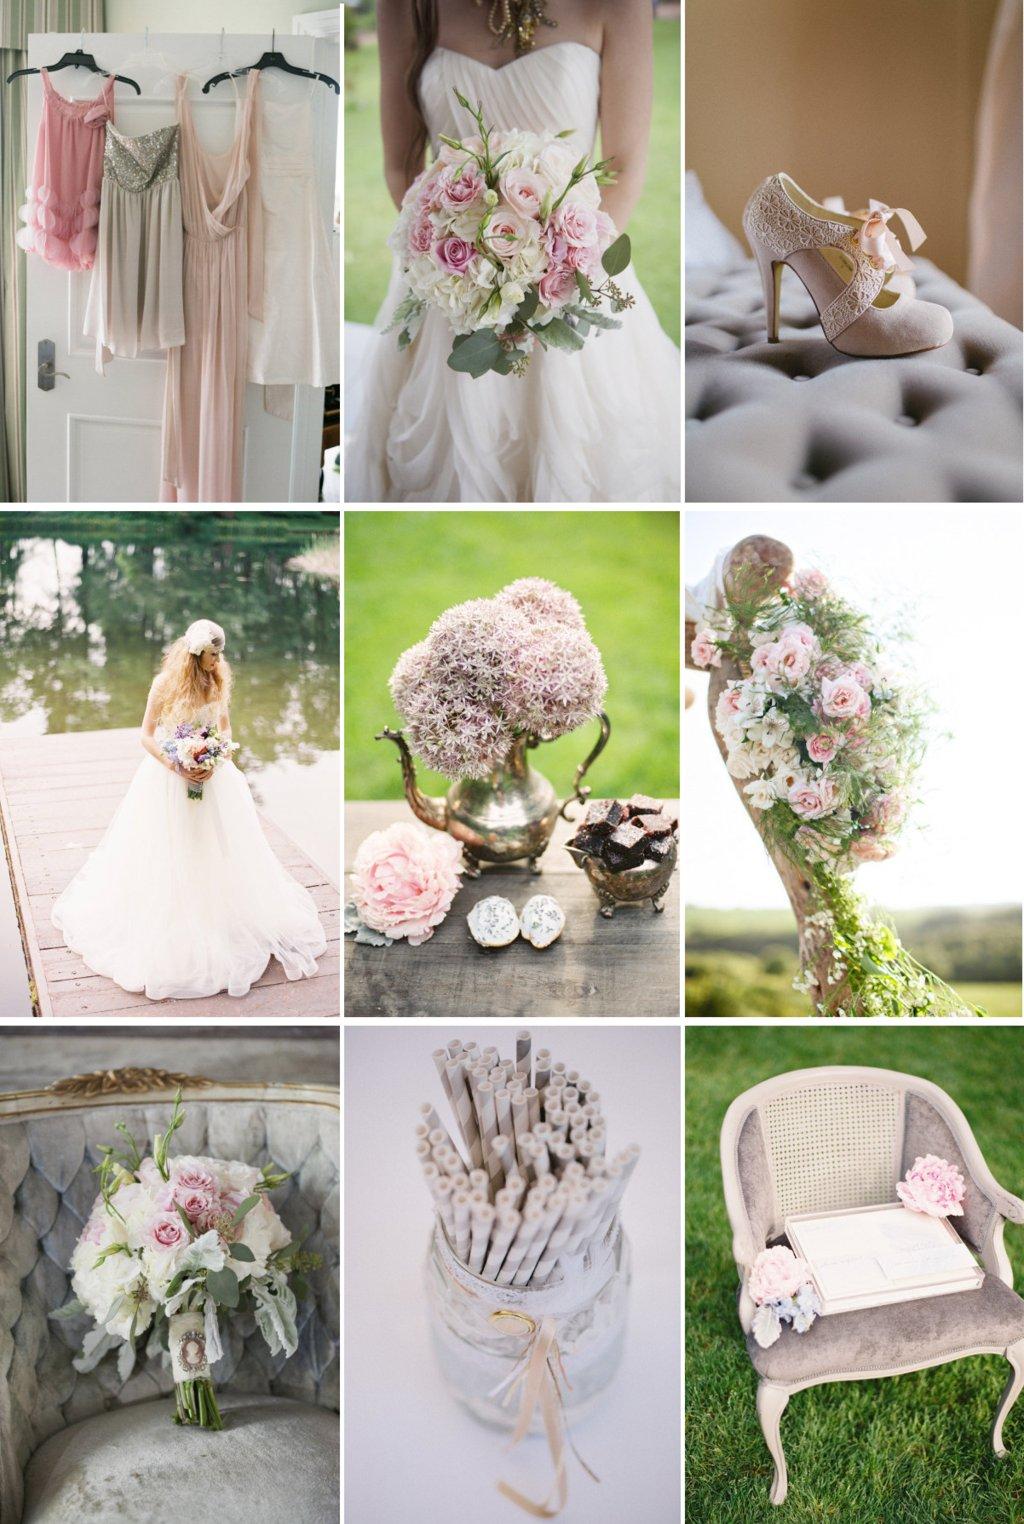 Romantic-wedding-color-palette-rosy-brown-sage-dove-gray-2.full